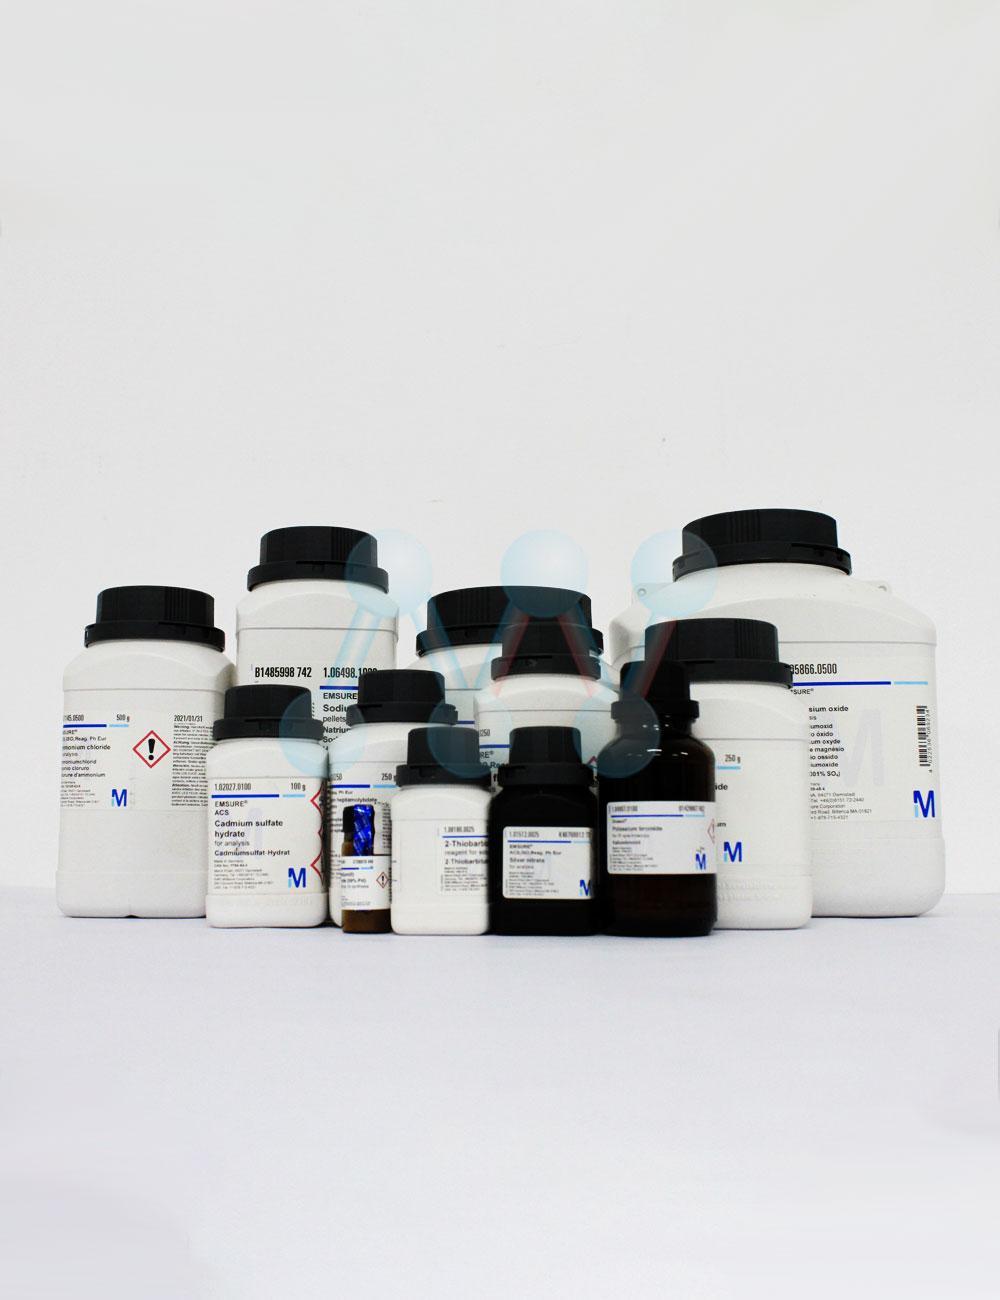 tri-Sodium Phosphate Dodecahydrate Na3PO4.12H2O